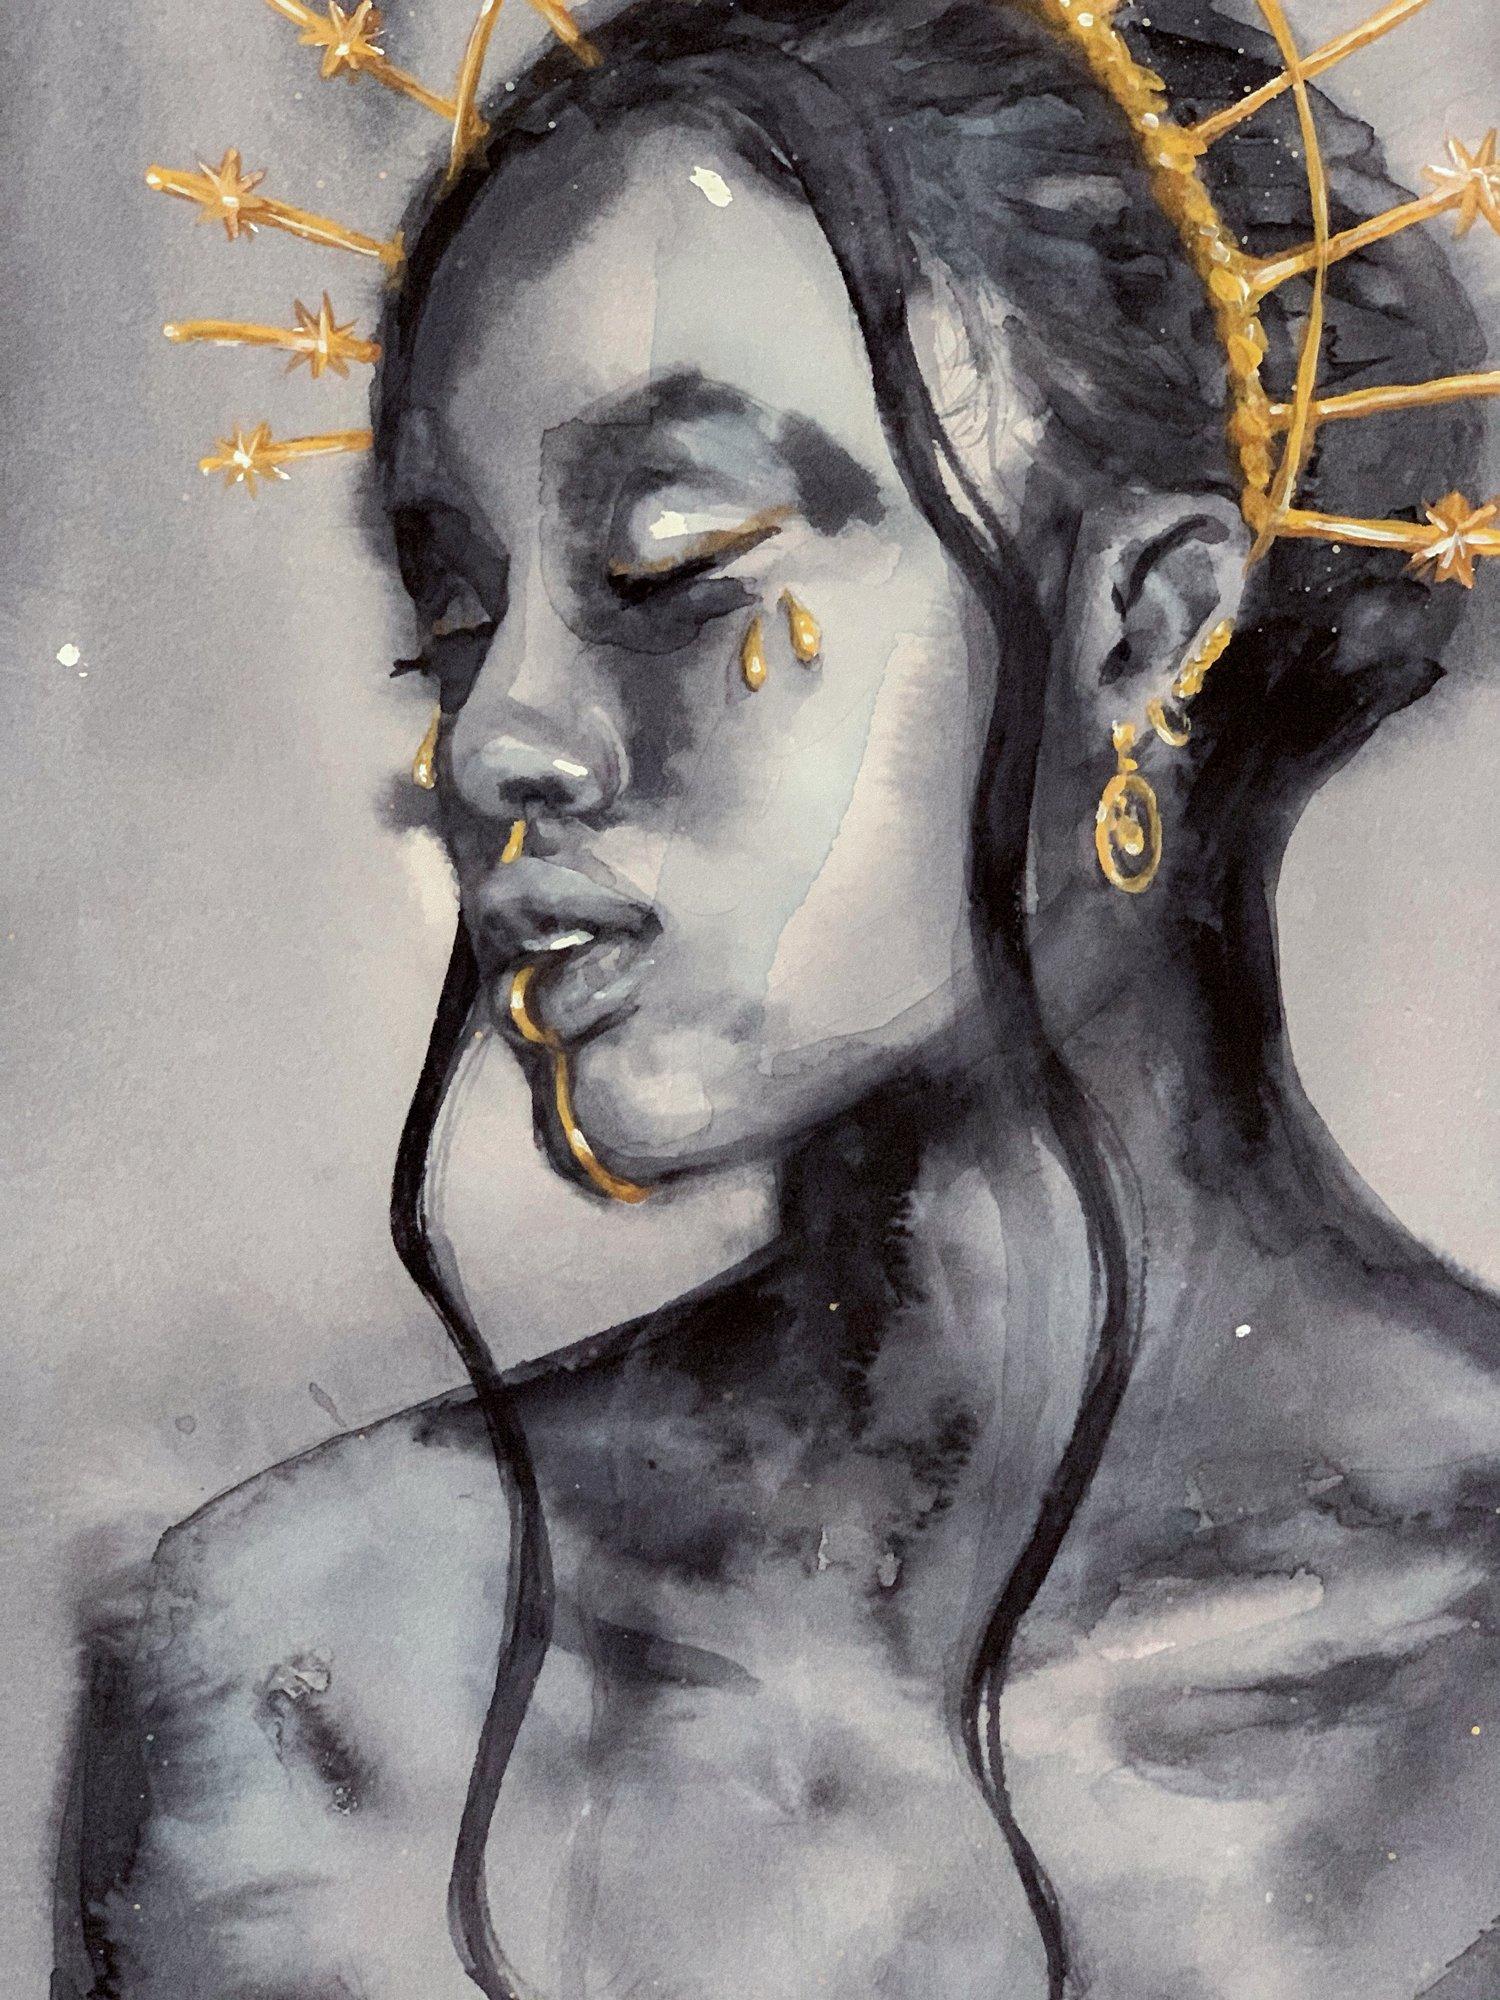 Agnes-Cecile black sun goddess